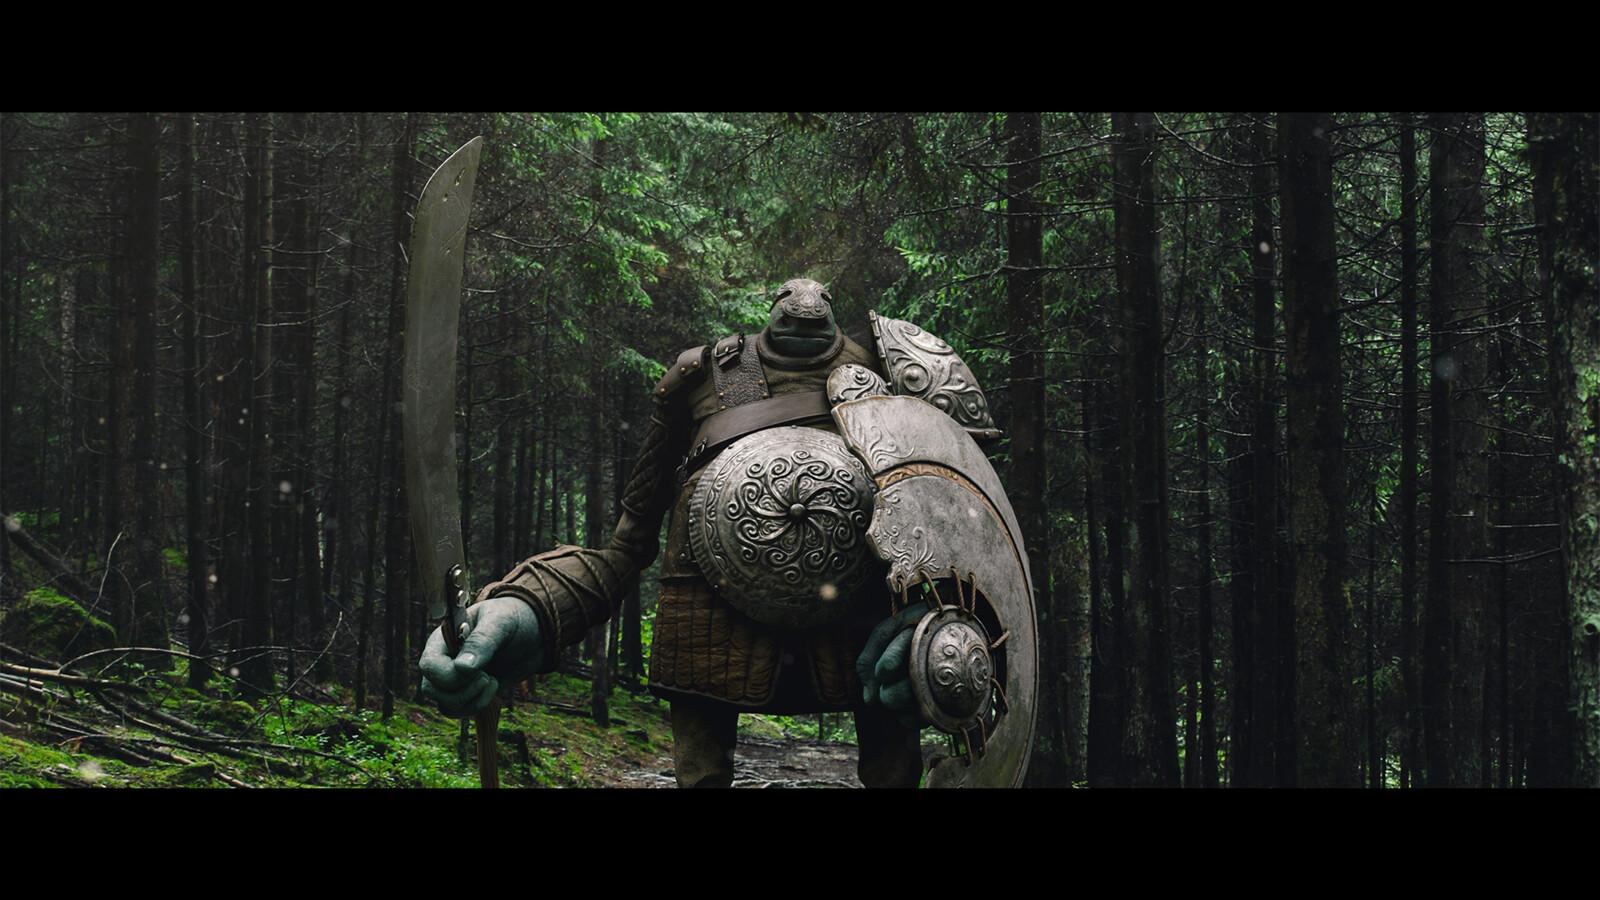 'cinematic' shot test